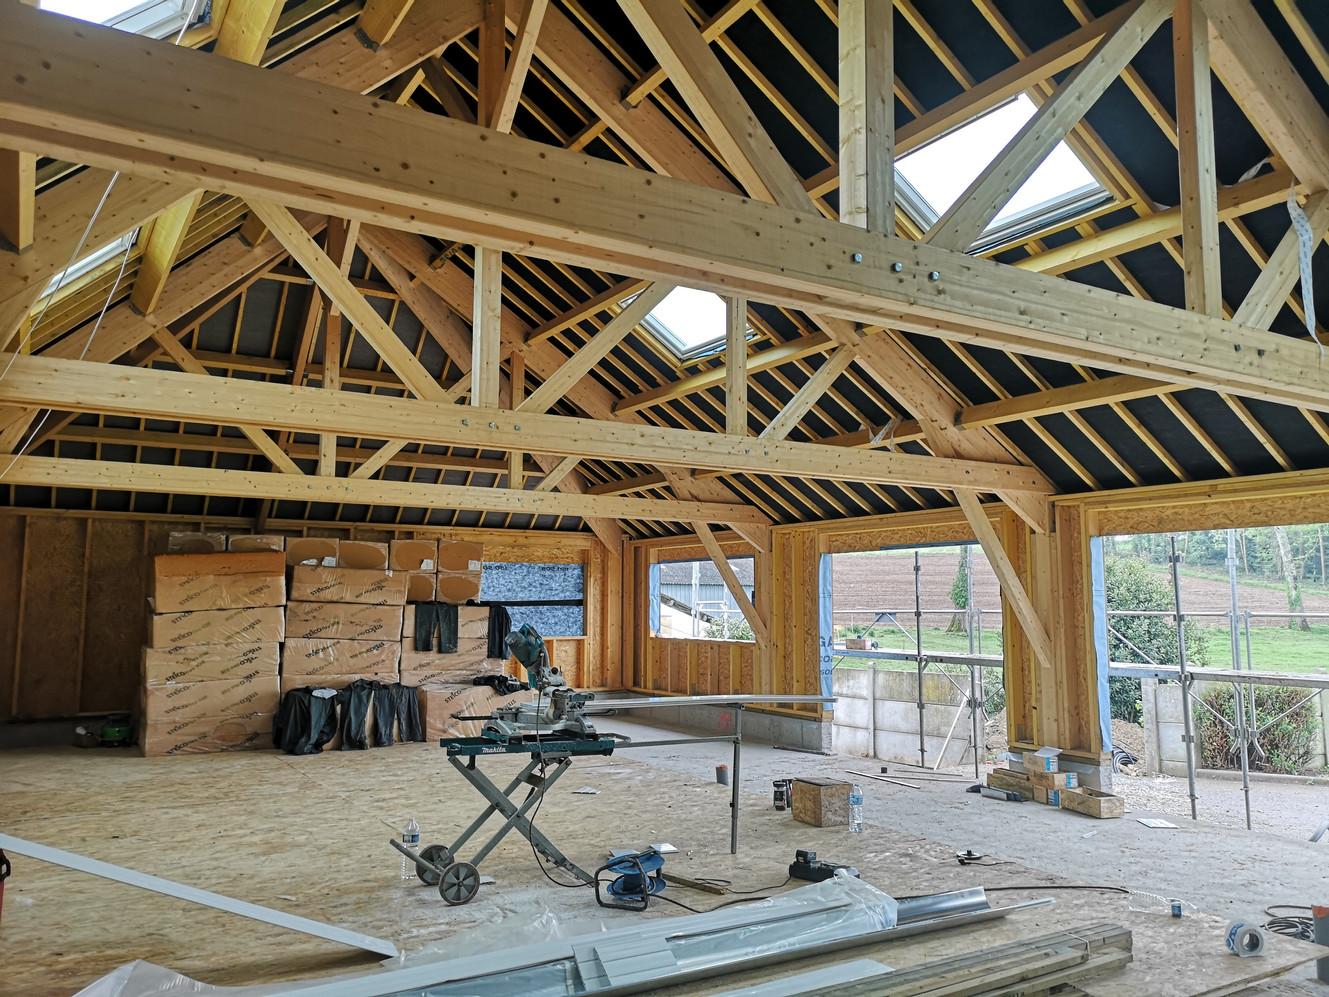 Maison, ossature bois, charpente, Lanouée, Morbihan